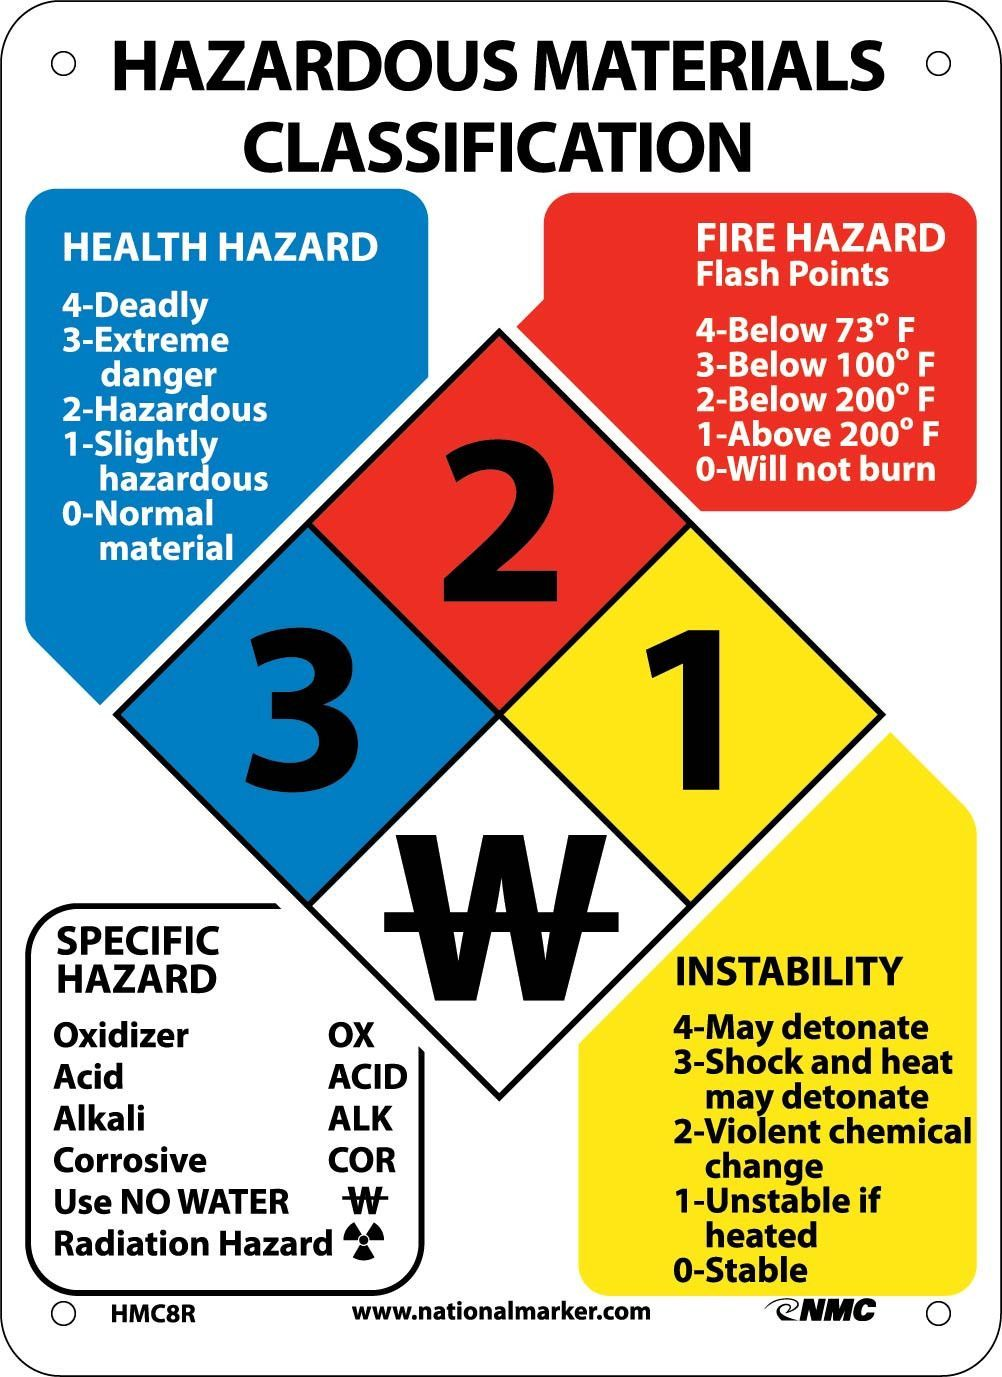 Chemical Hazard ID Classification System, Hazardous